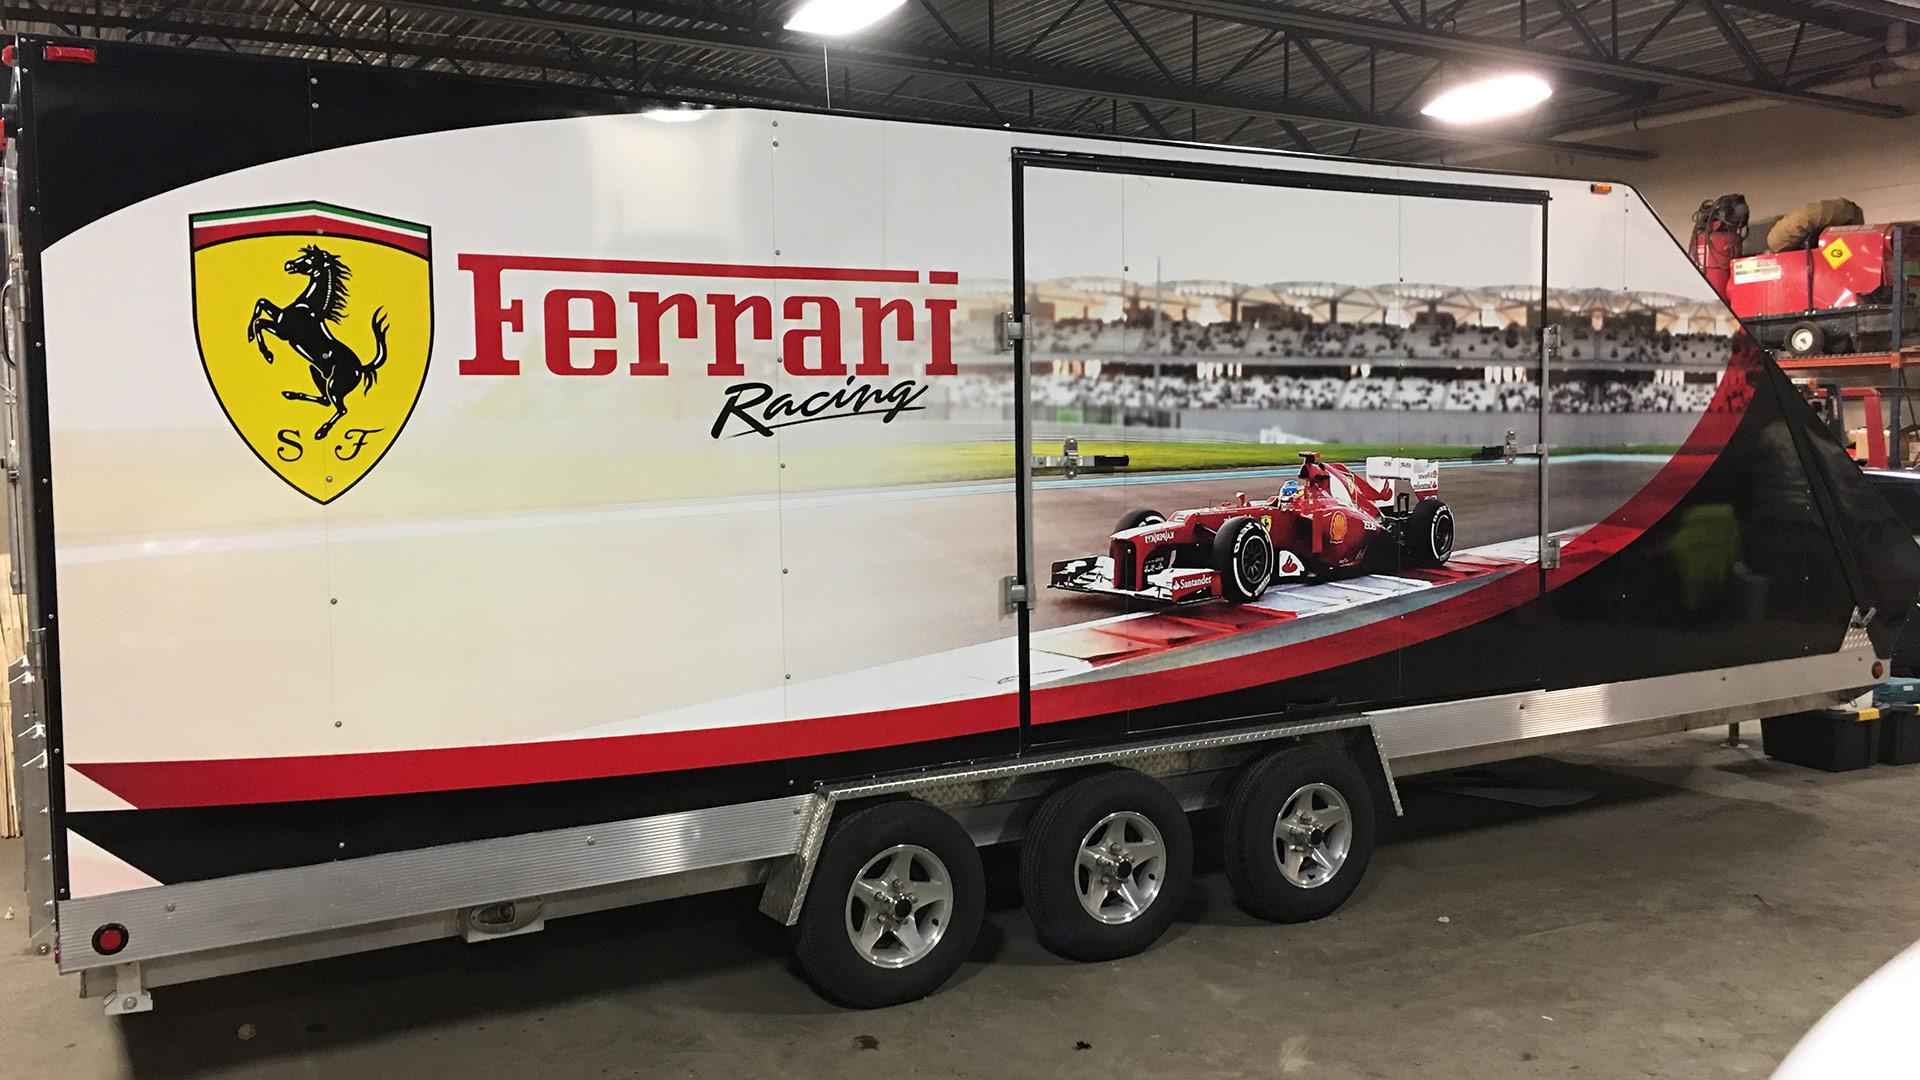 Ferrari Racing Trailer